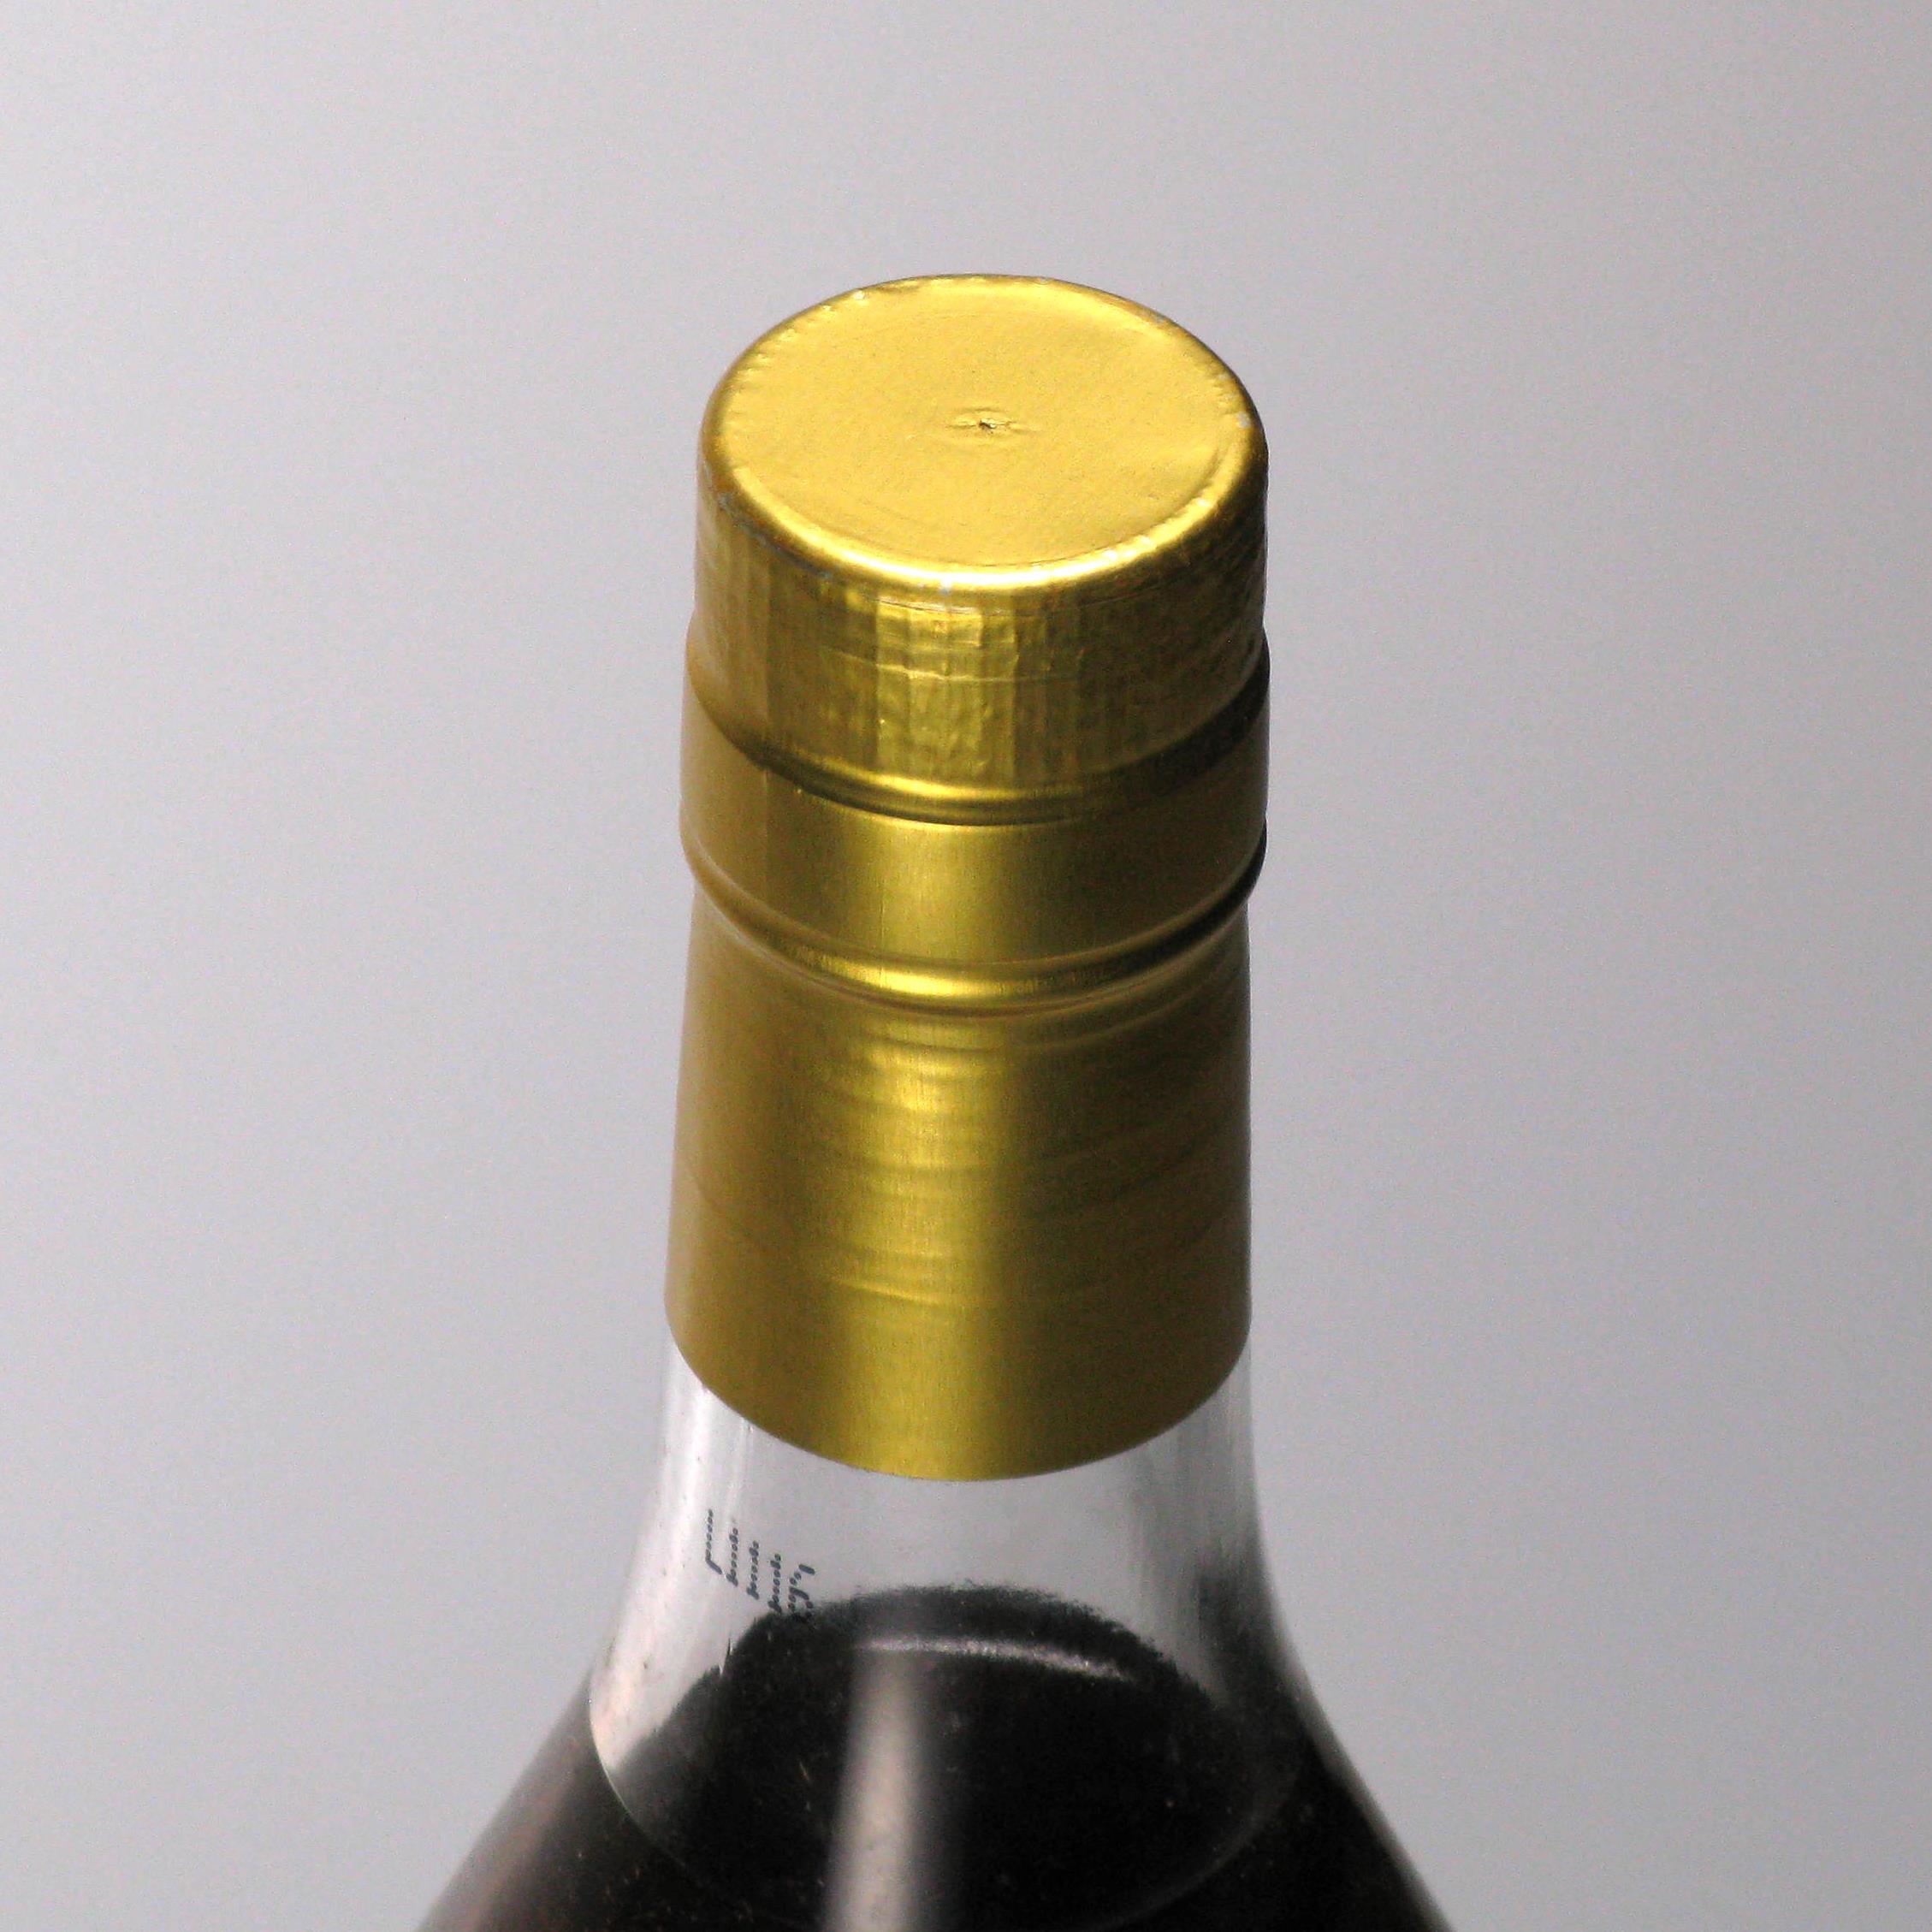 Cognac 1983 Hine